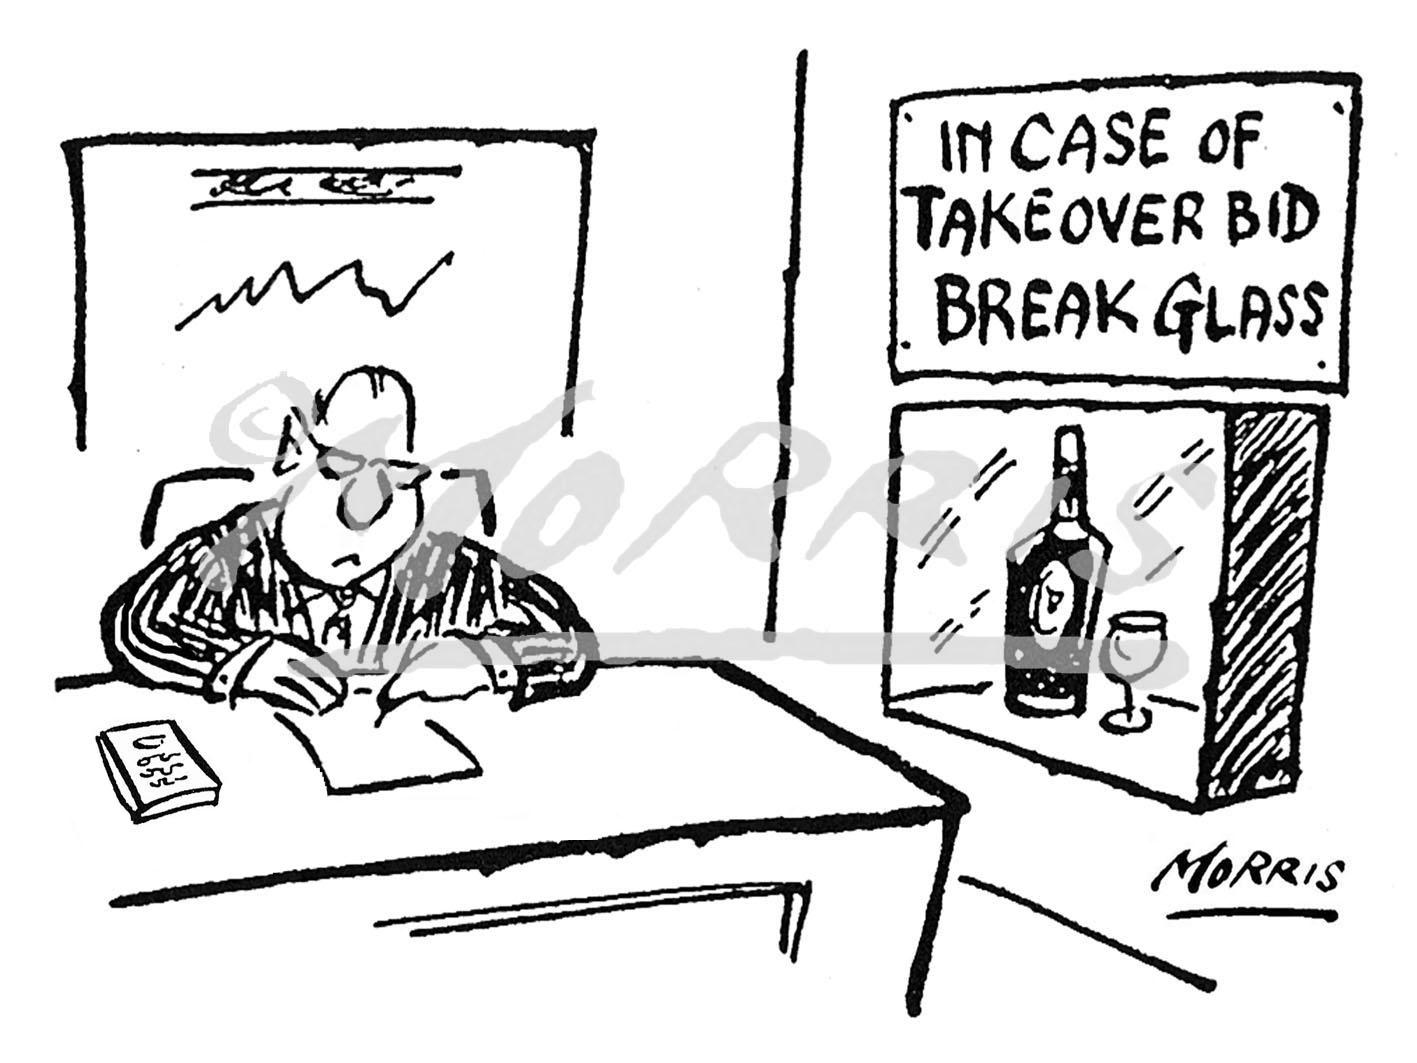 Company takeover bid business cartoon Ref: 0329bw